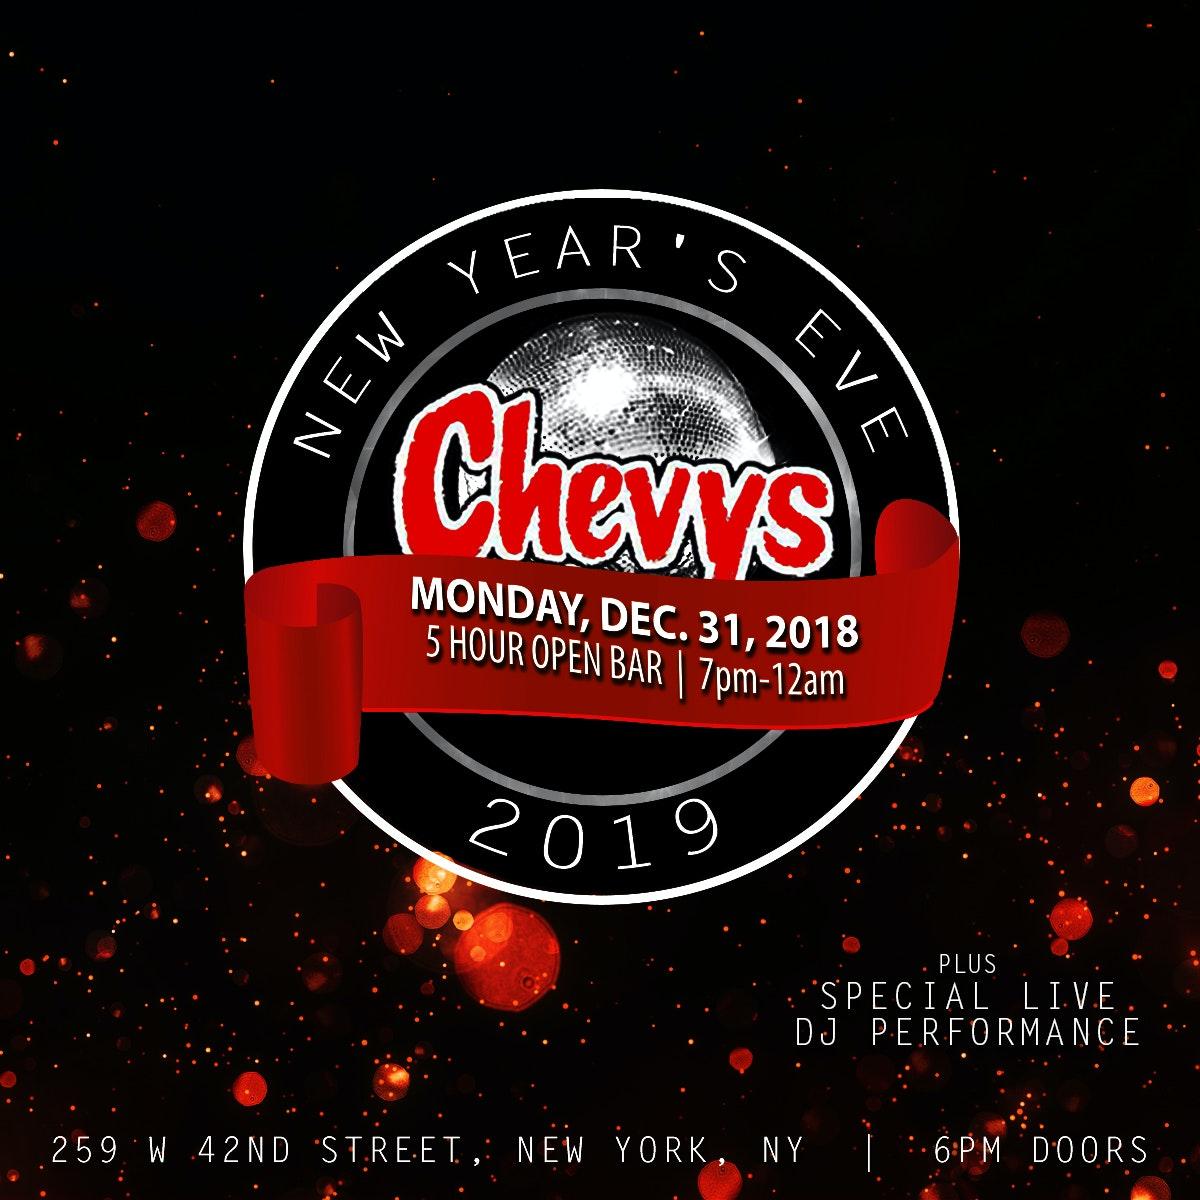 Chevys Times Square